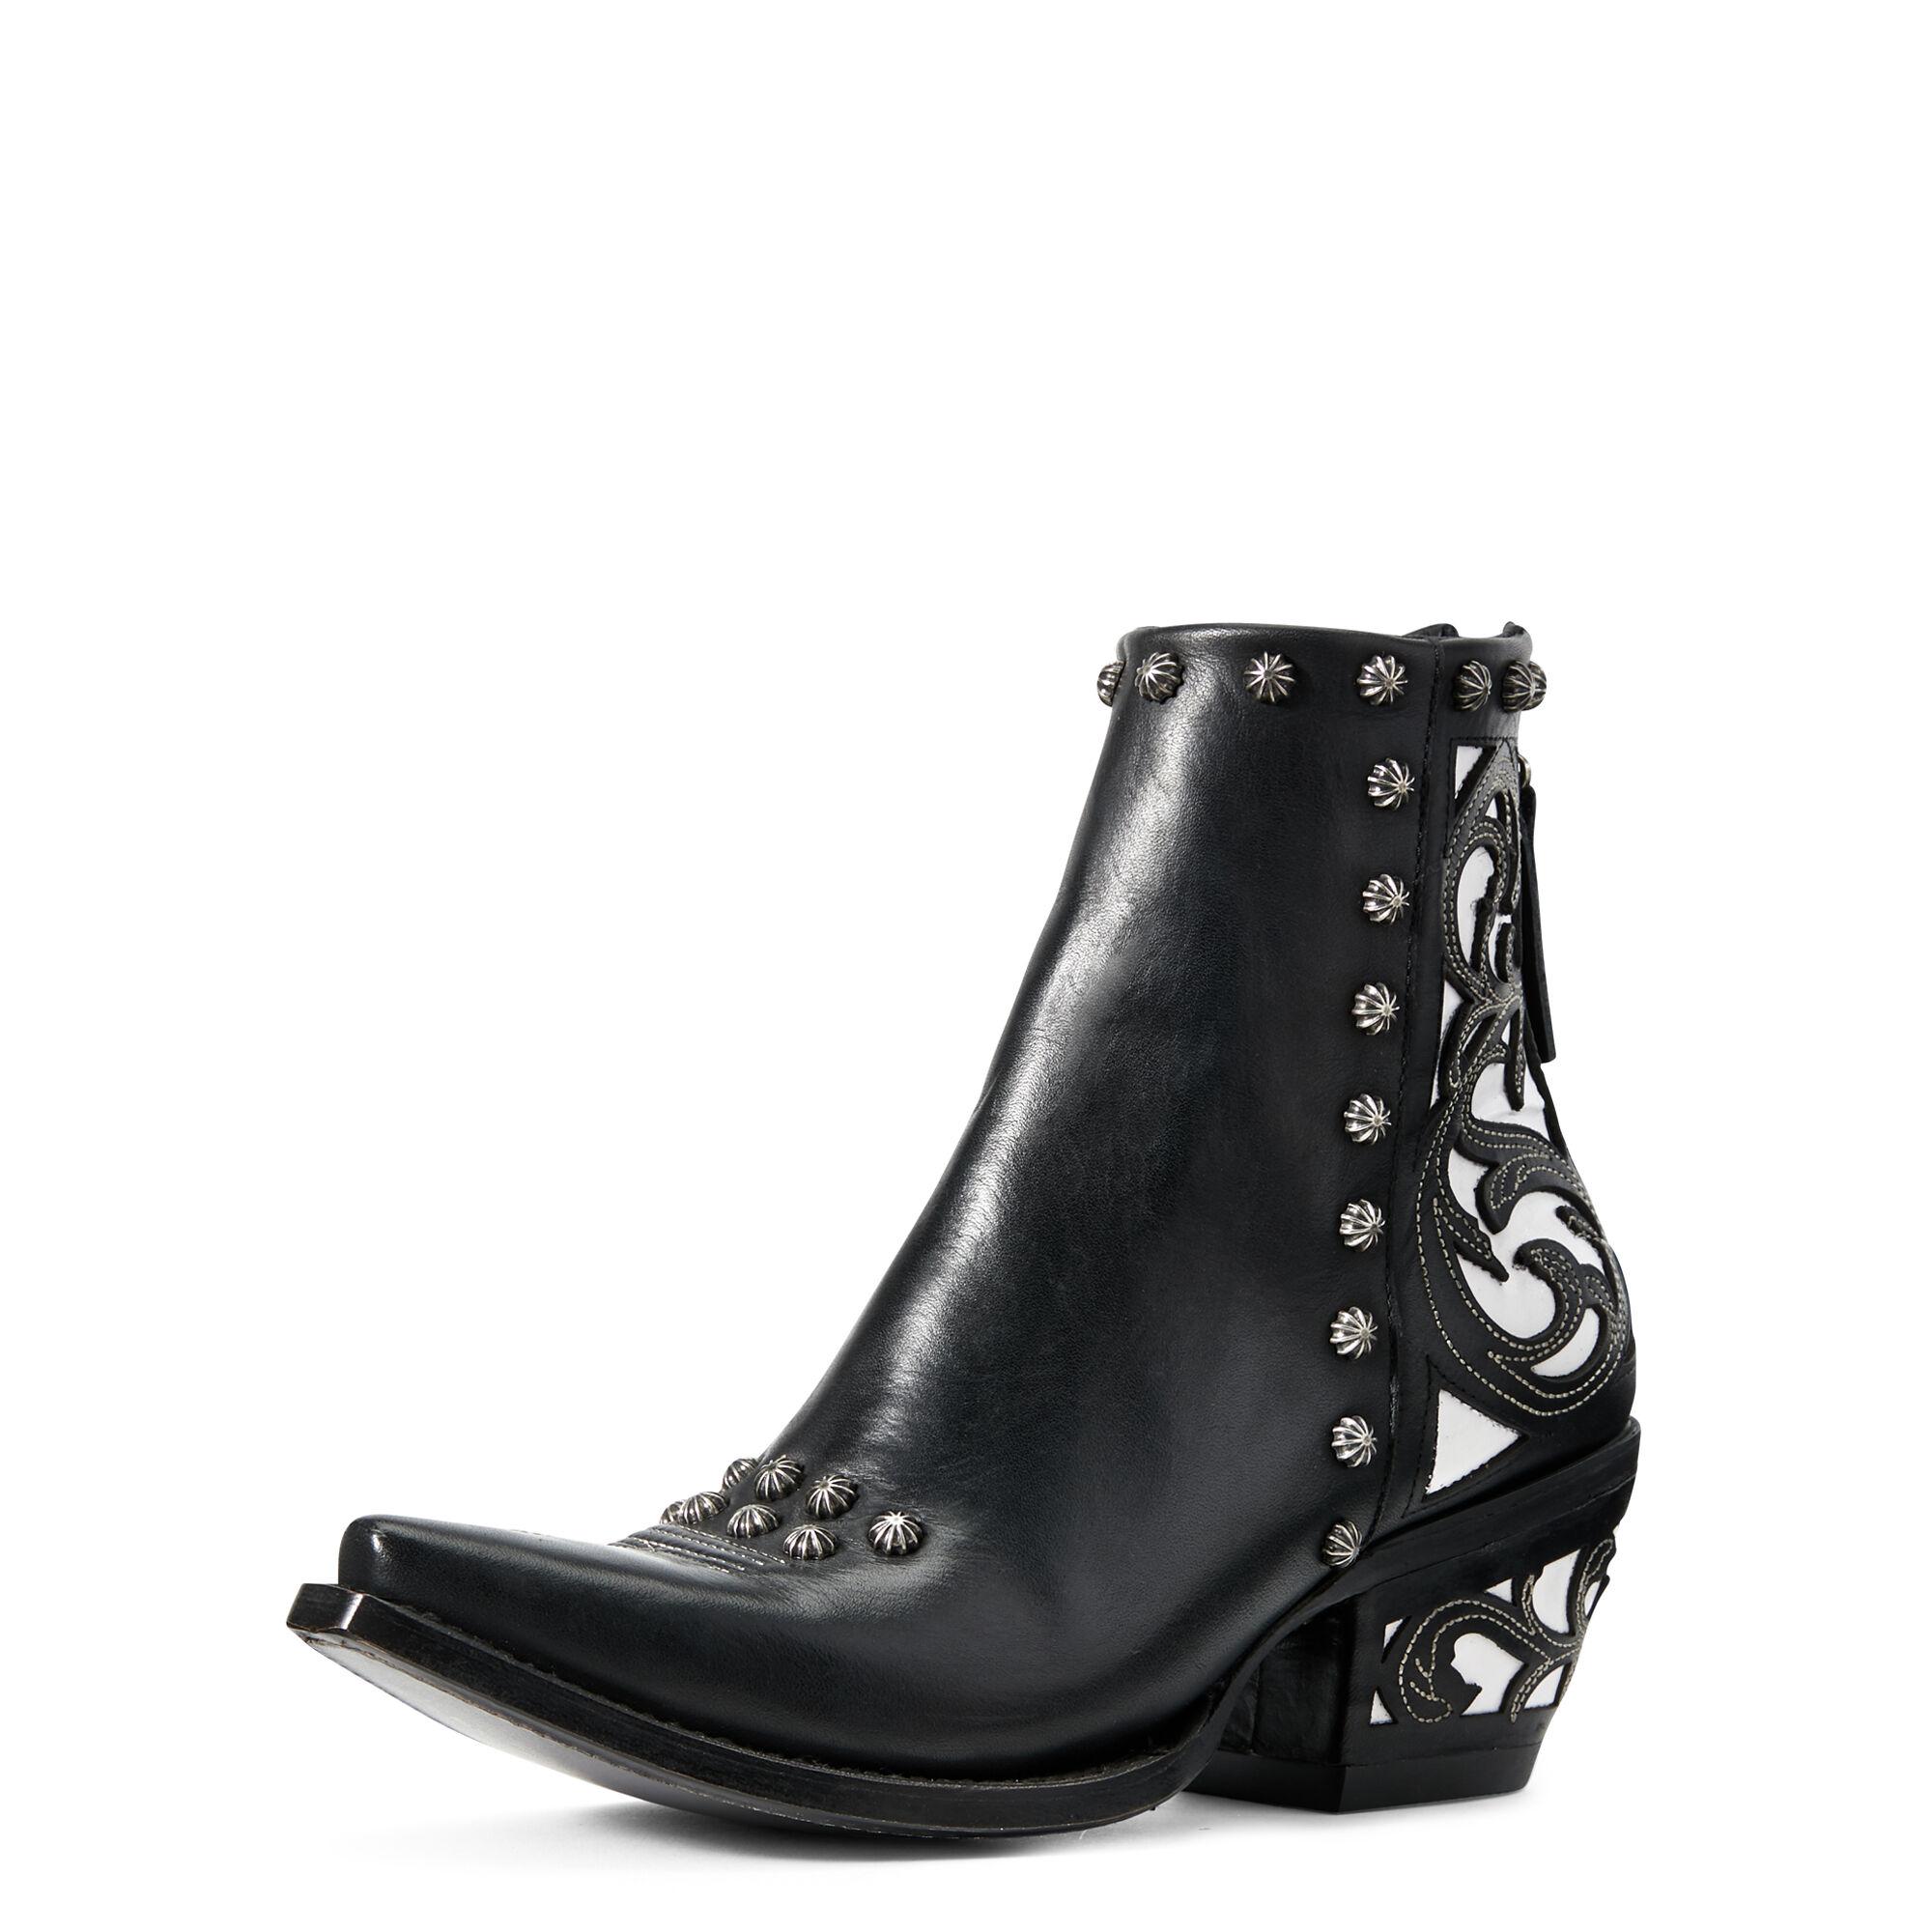 Ariat Diva Western Boots in Midnight Black